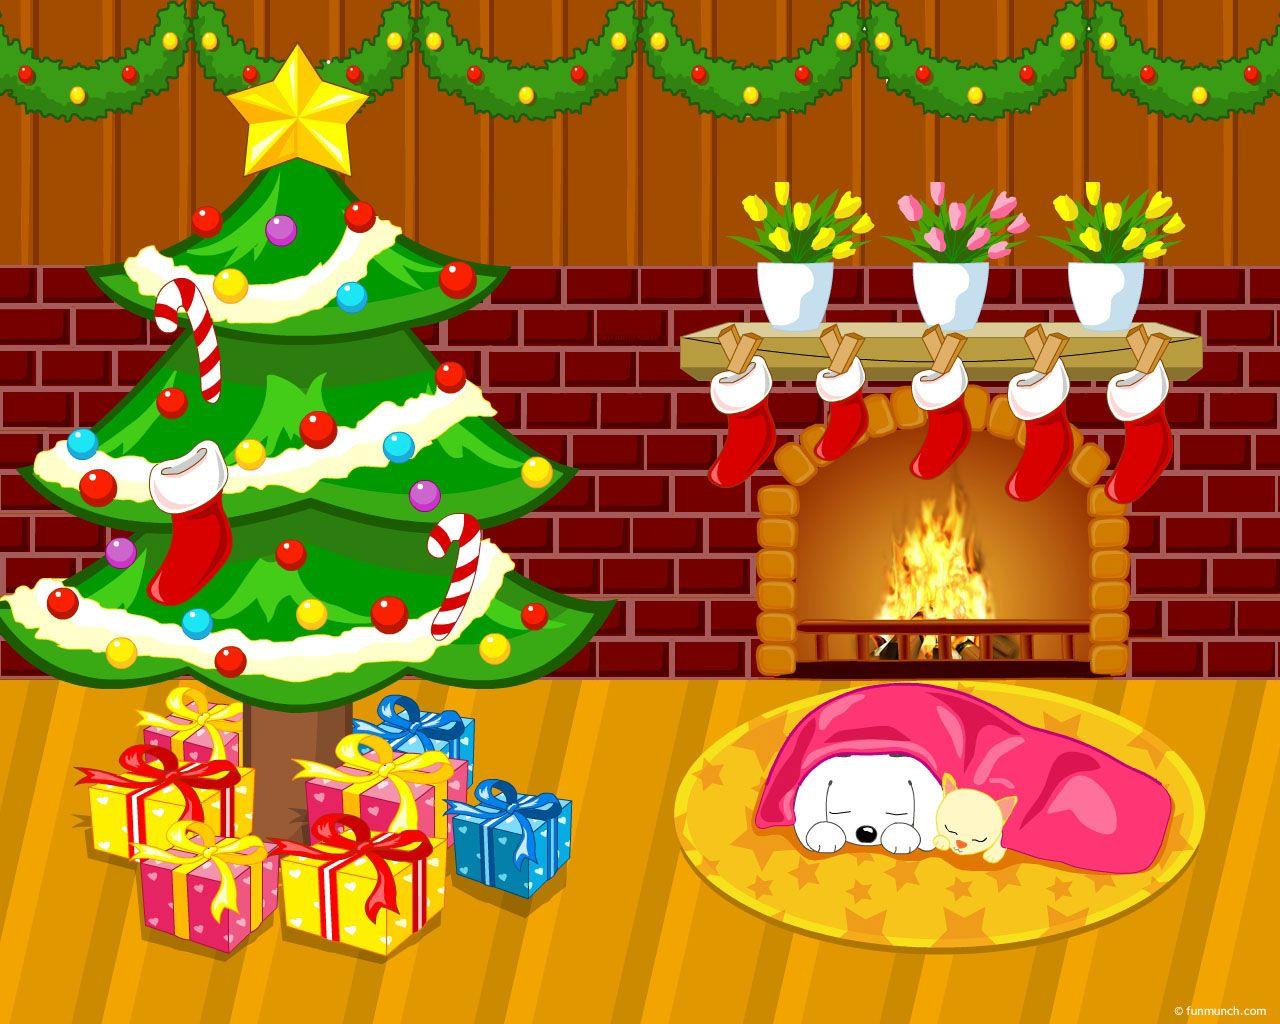 Christmas Tree Cartoon Wallpaper Merry Christmas Pictures Christmas Colors Cartoon Christmas Tree